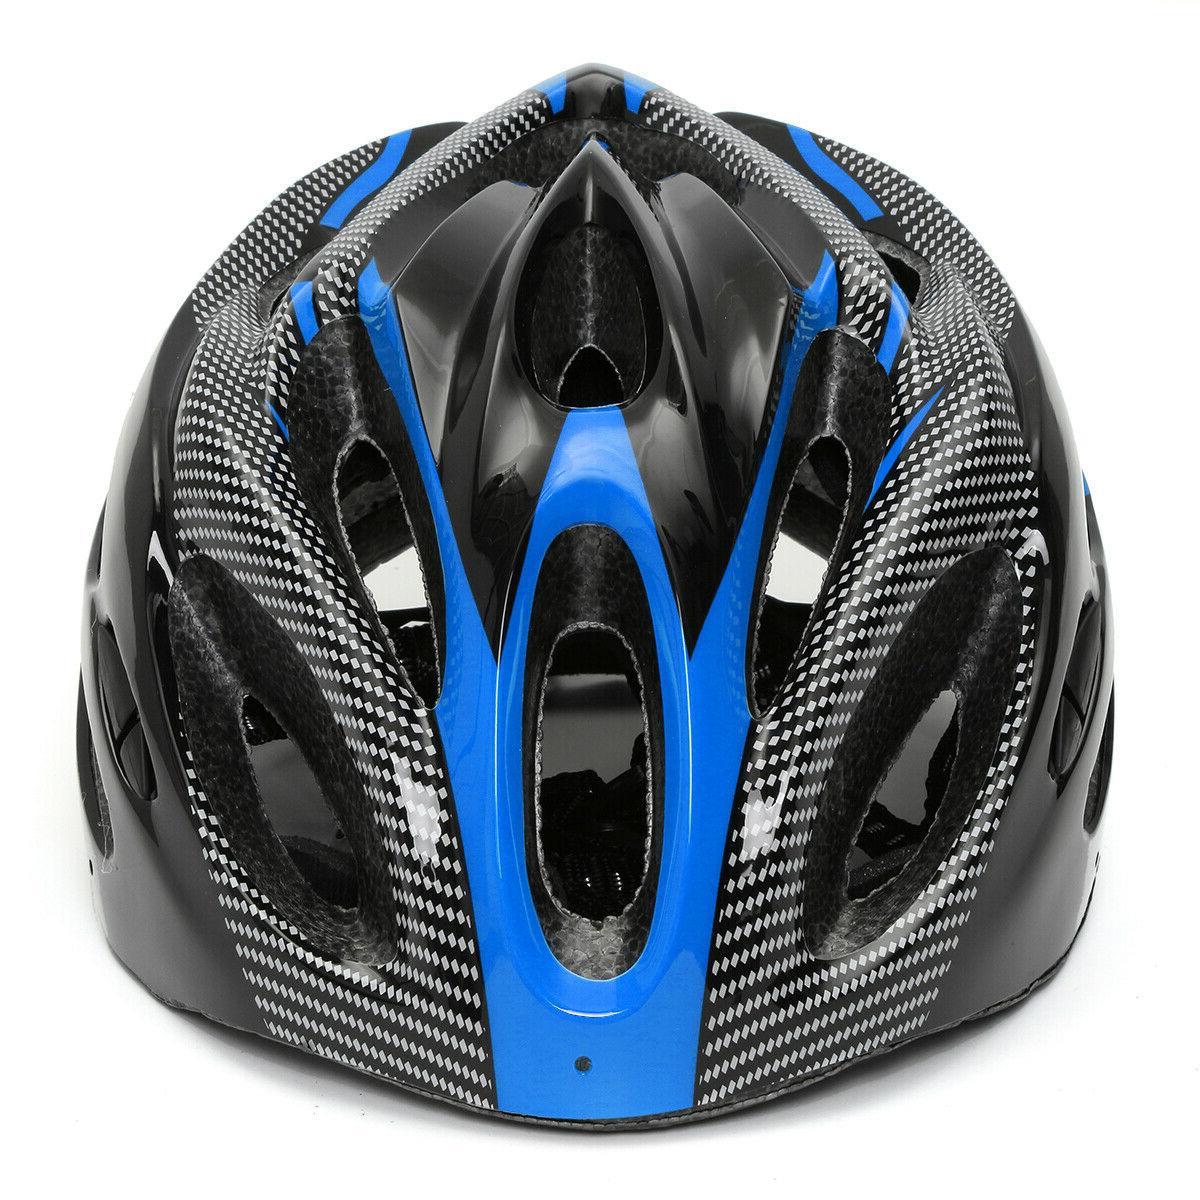 Cycling Bike Helmet Carbon Color USA